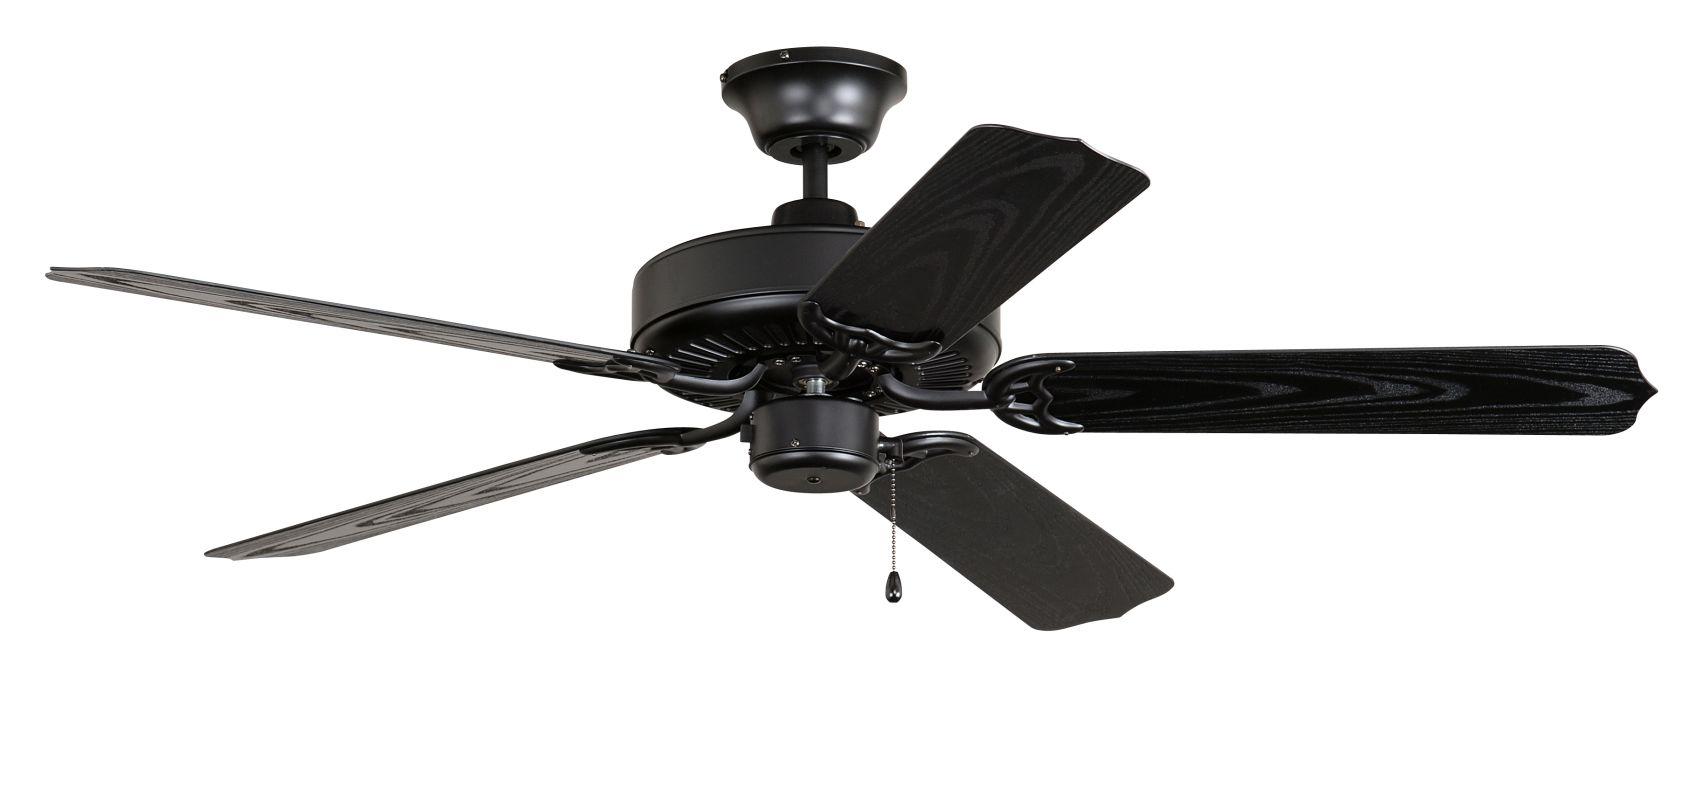 "Ellington Fans All Weather-52 Outdoor 52"" 5 Blade Indoor Ceiling Fan -"